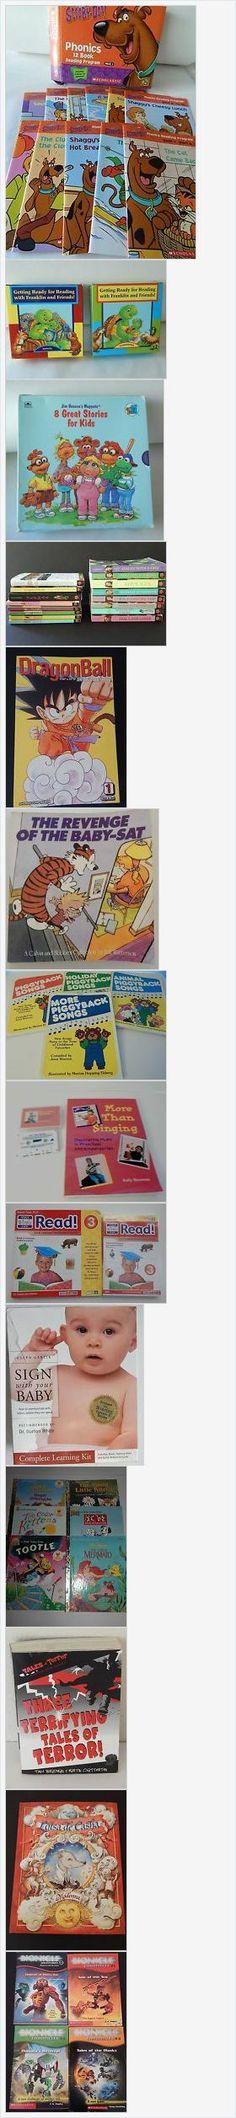 #Childrens #Books #Reading in #LargoWares store on eBay!